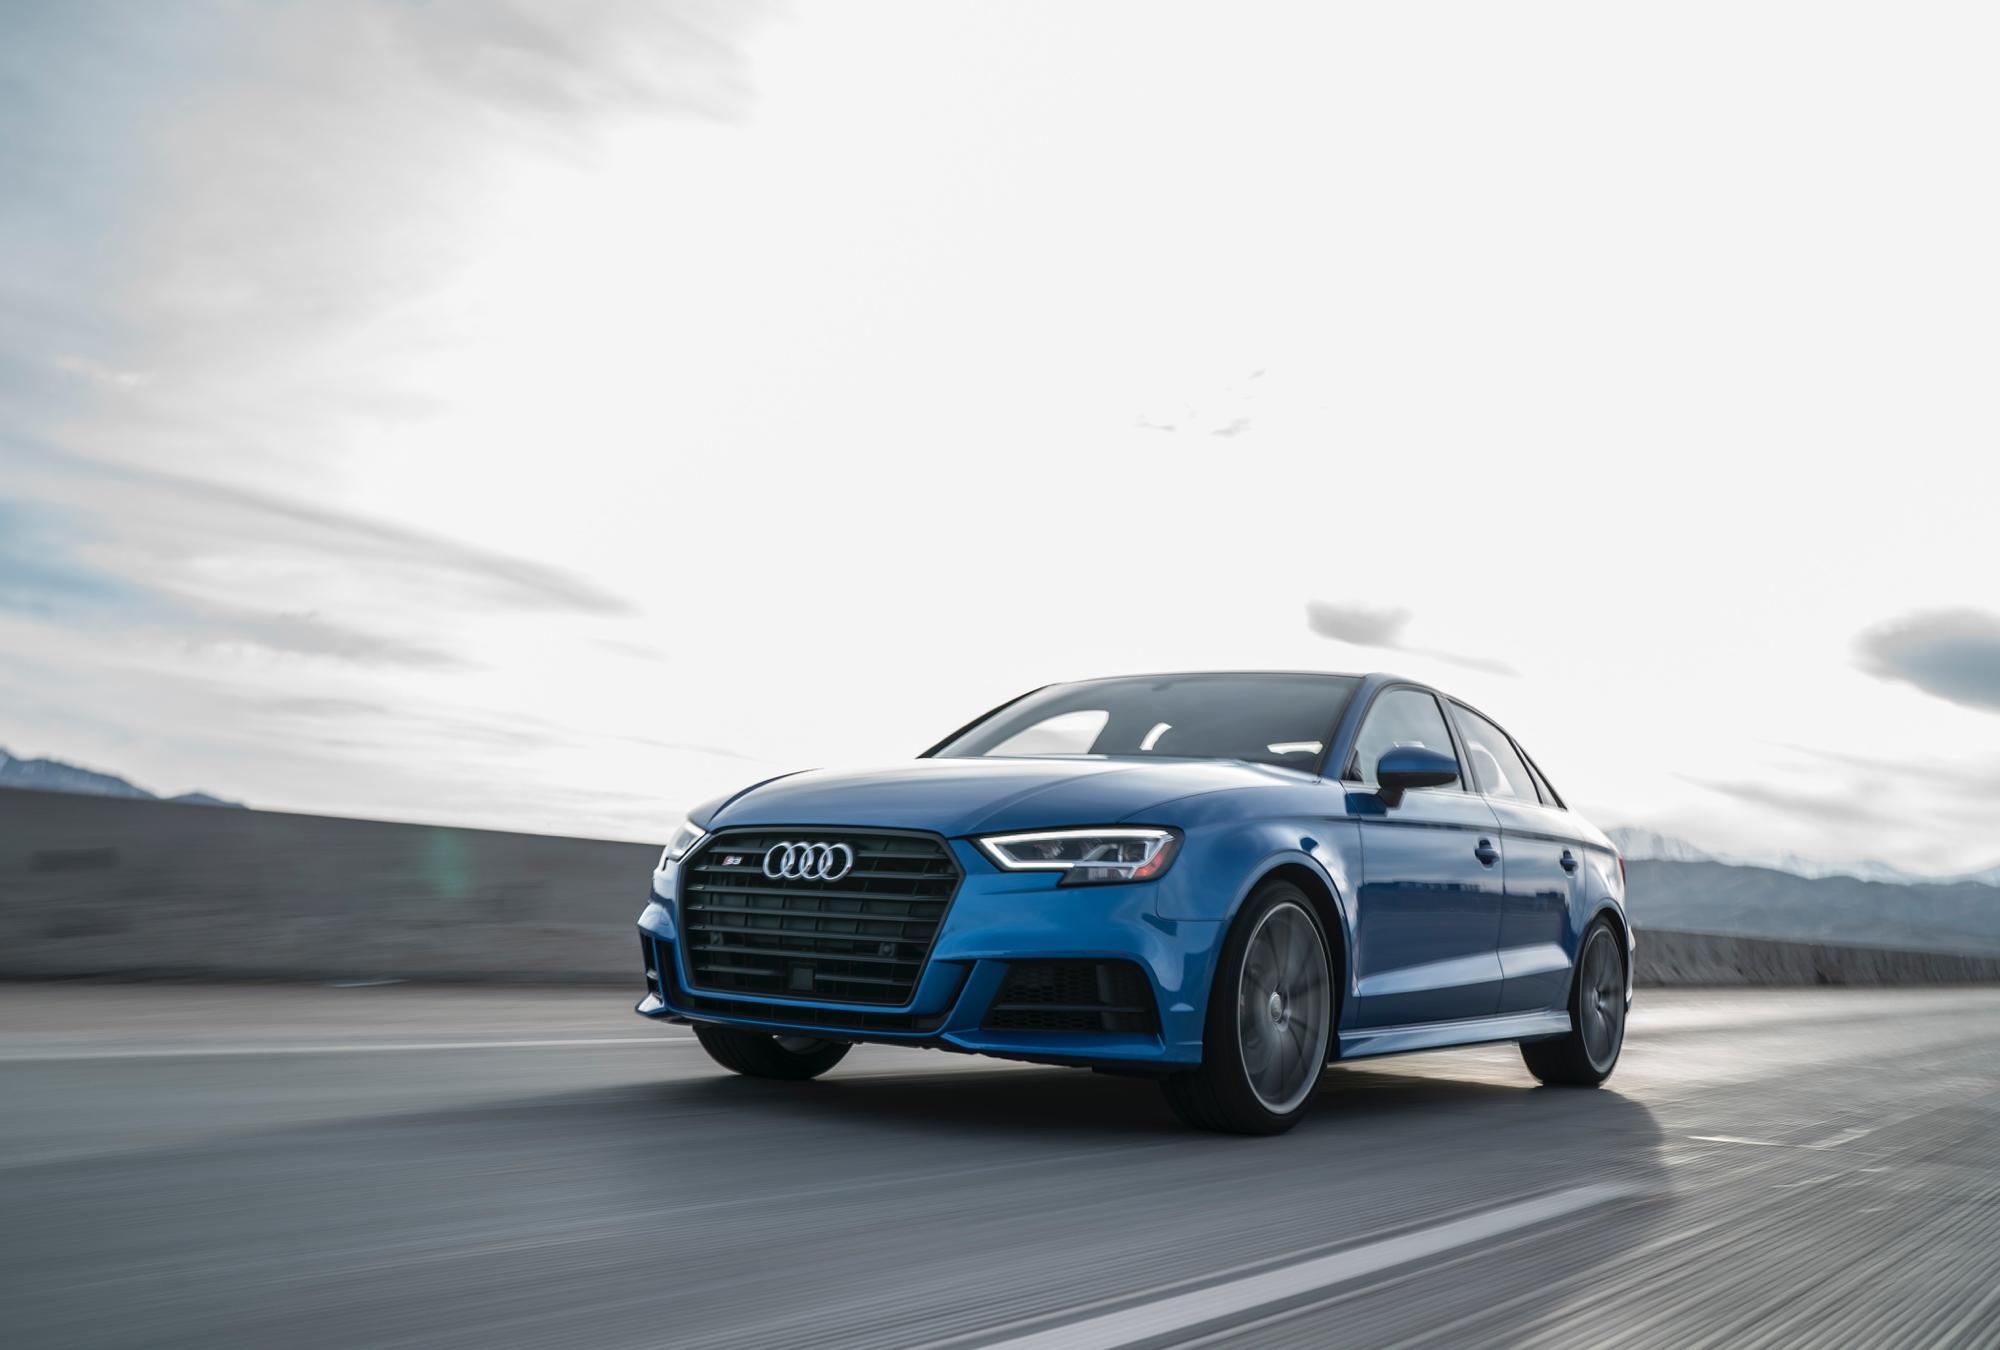 Audi - Kiosk user experience design